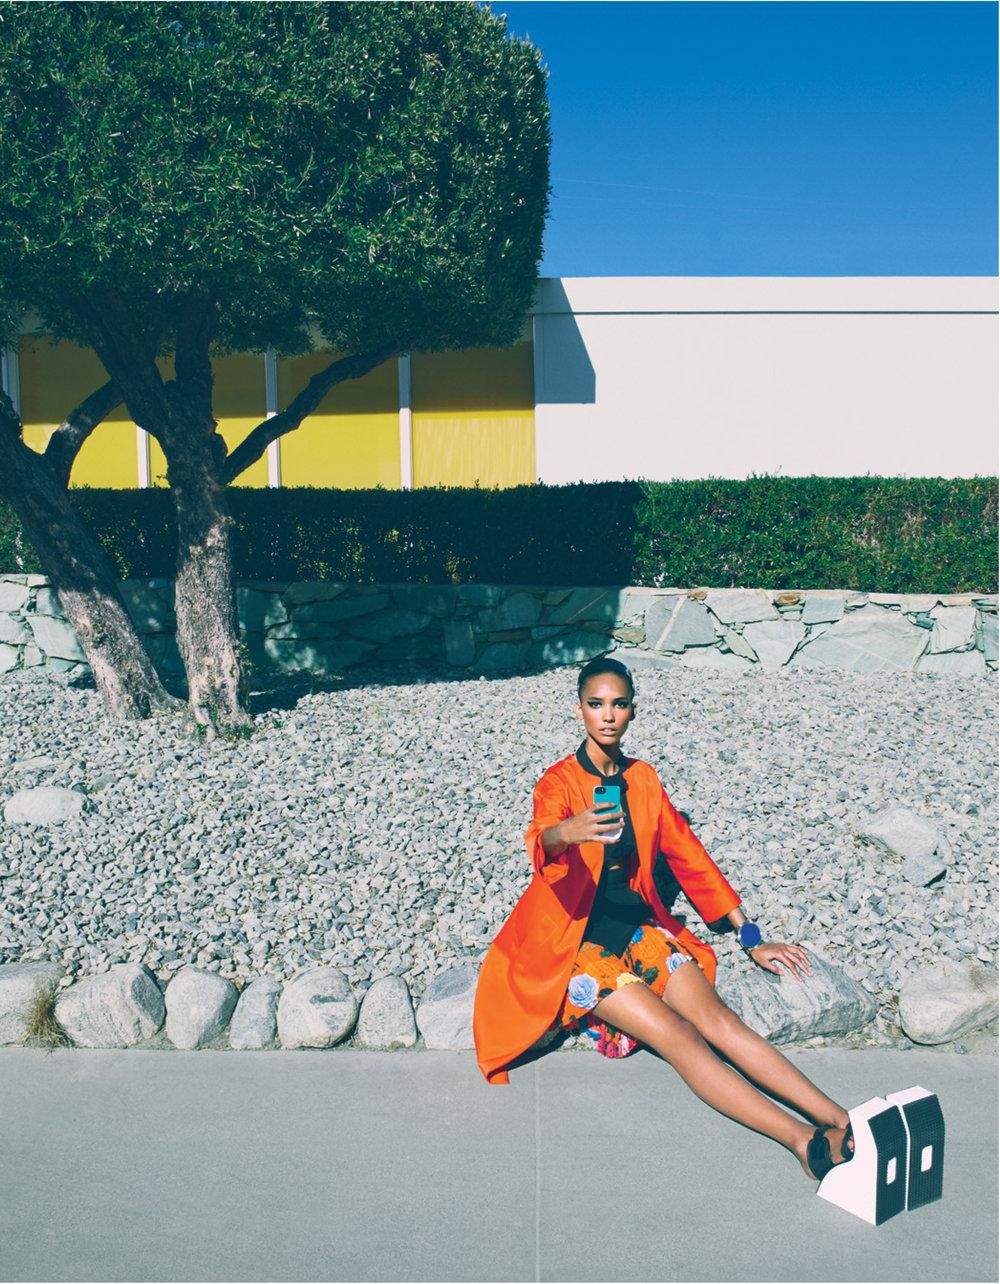 Giovanna-Battaglia-1-Selfie-Absorbed-W-Magazine-Emma-Summerton.jpg